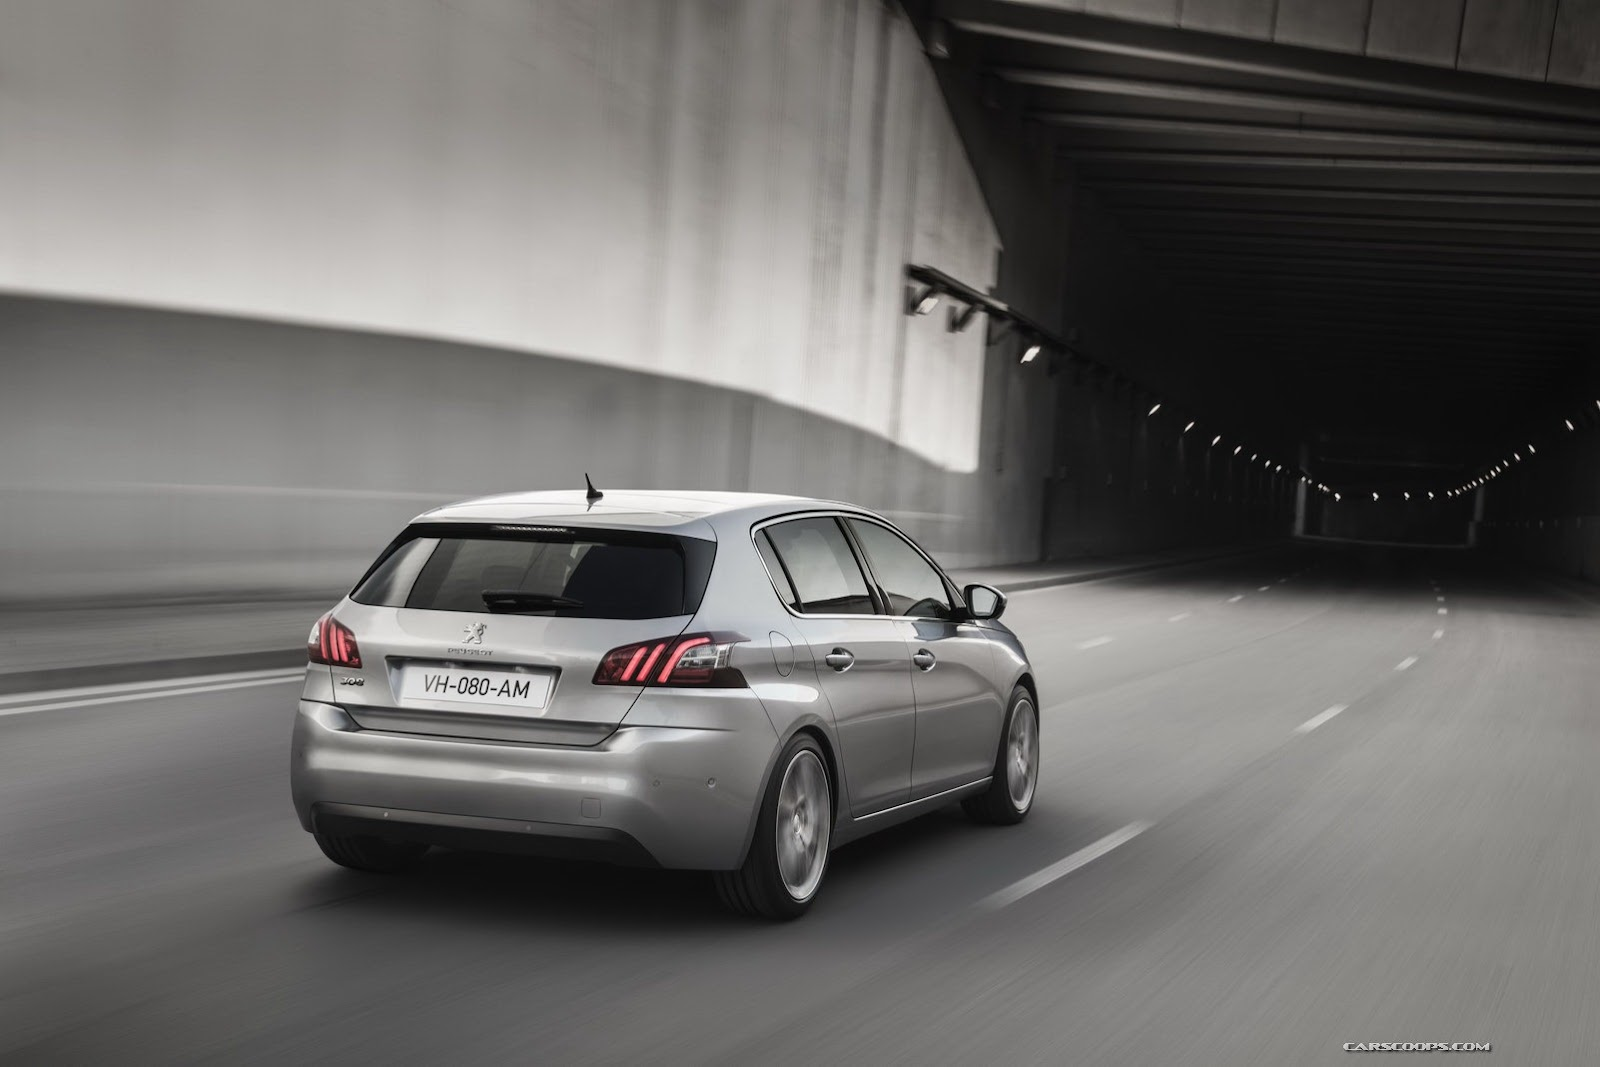 2014-Peugeot-308-Hatch-Carscoops-80%25255B2%25255D.jpg